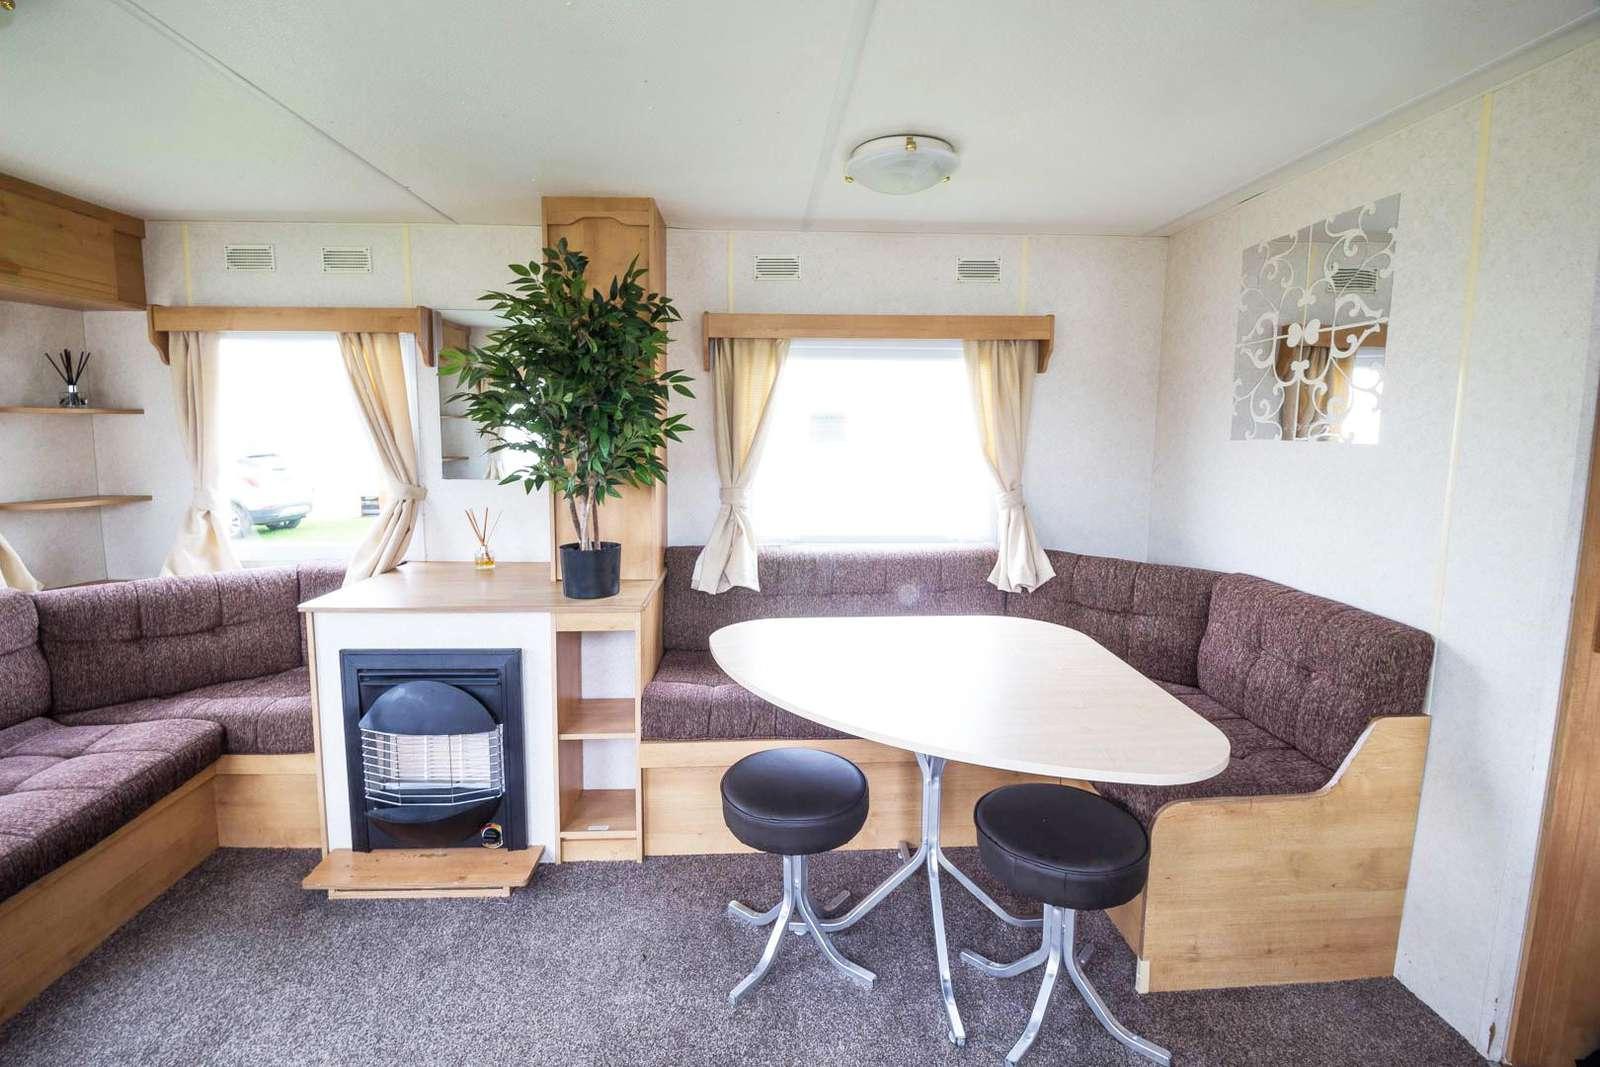 50021F – Fulmar area, 3 bed, 8 berth caravan near amenities. Emerald rated. - property